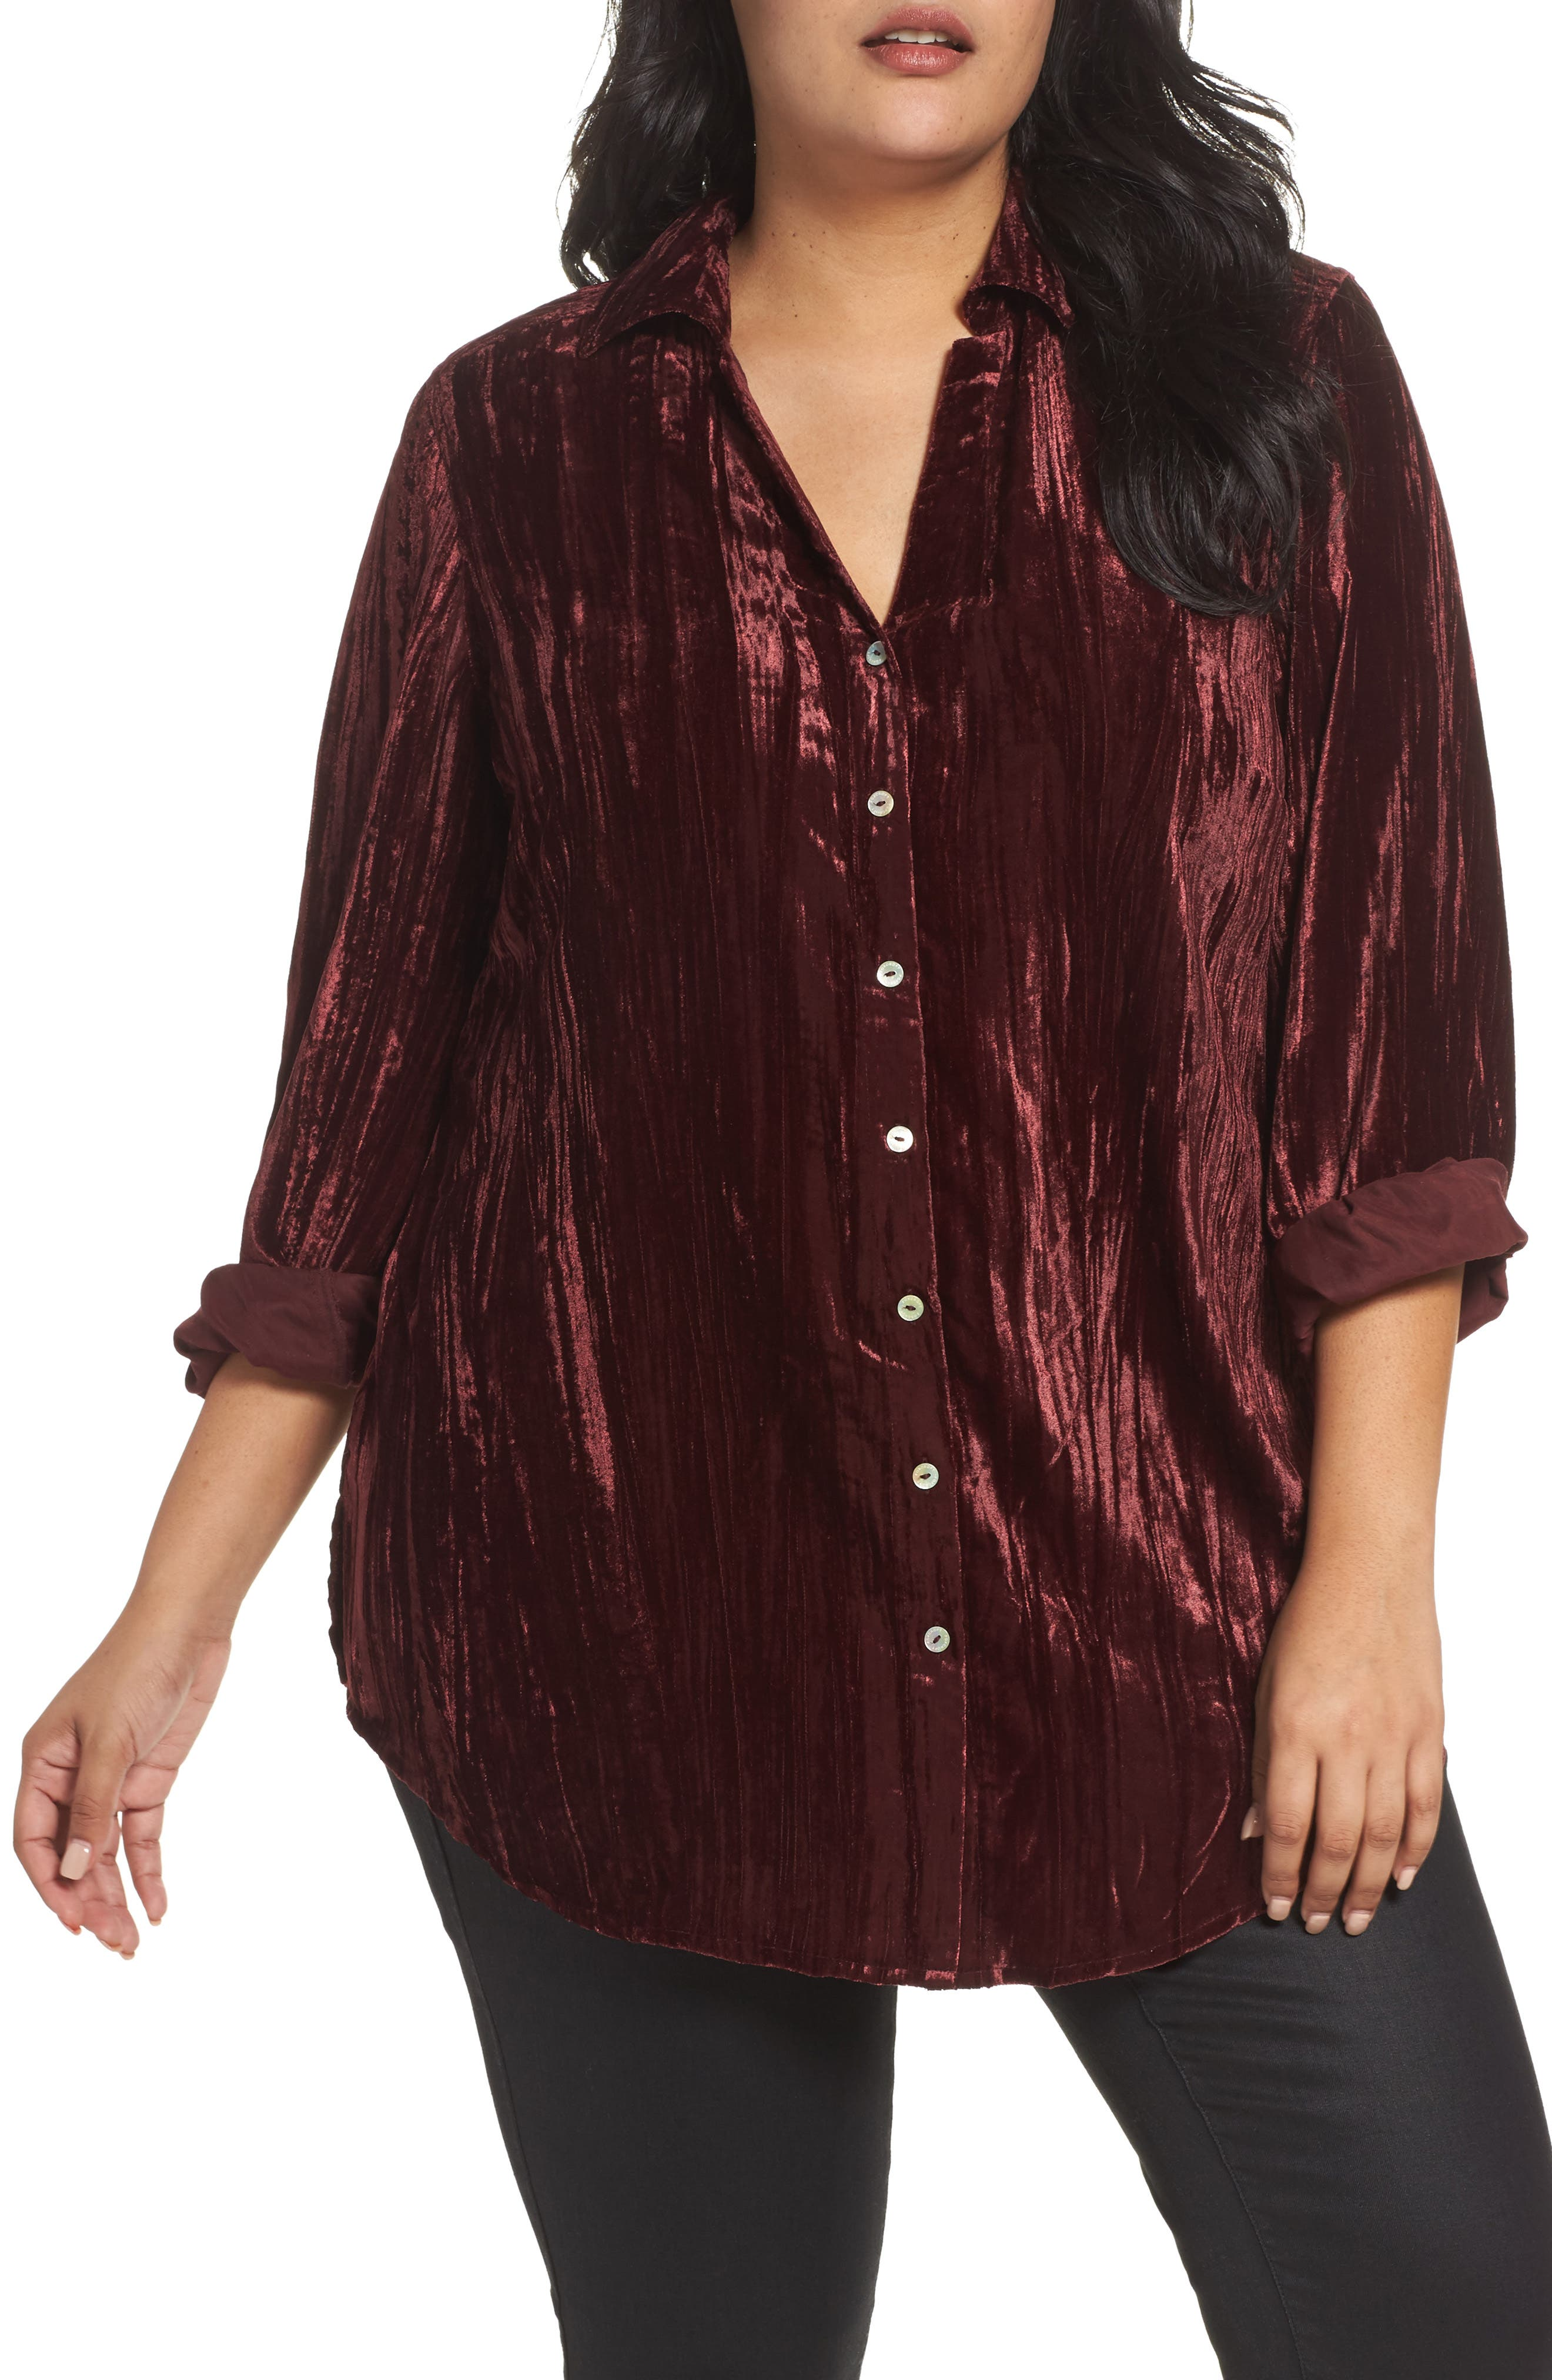 Foxcroft Ivy Broomstick Velvet Shirt (Plus Size)